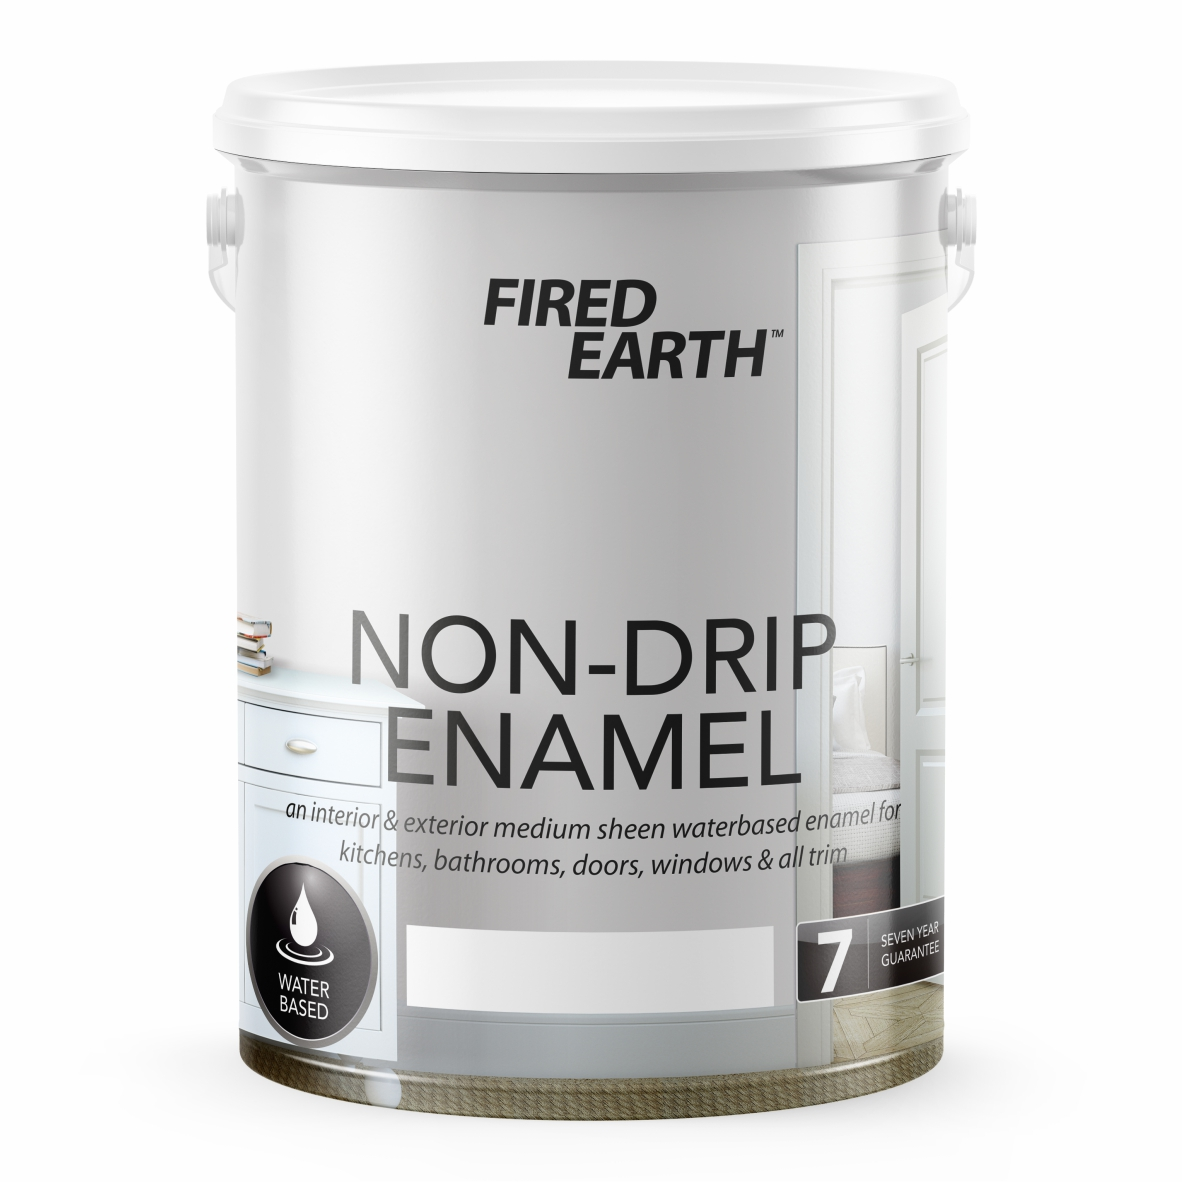 FE Non-Drip Enamel.jpg